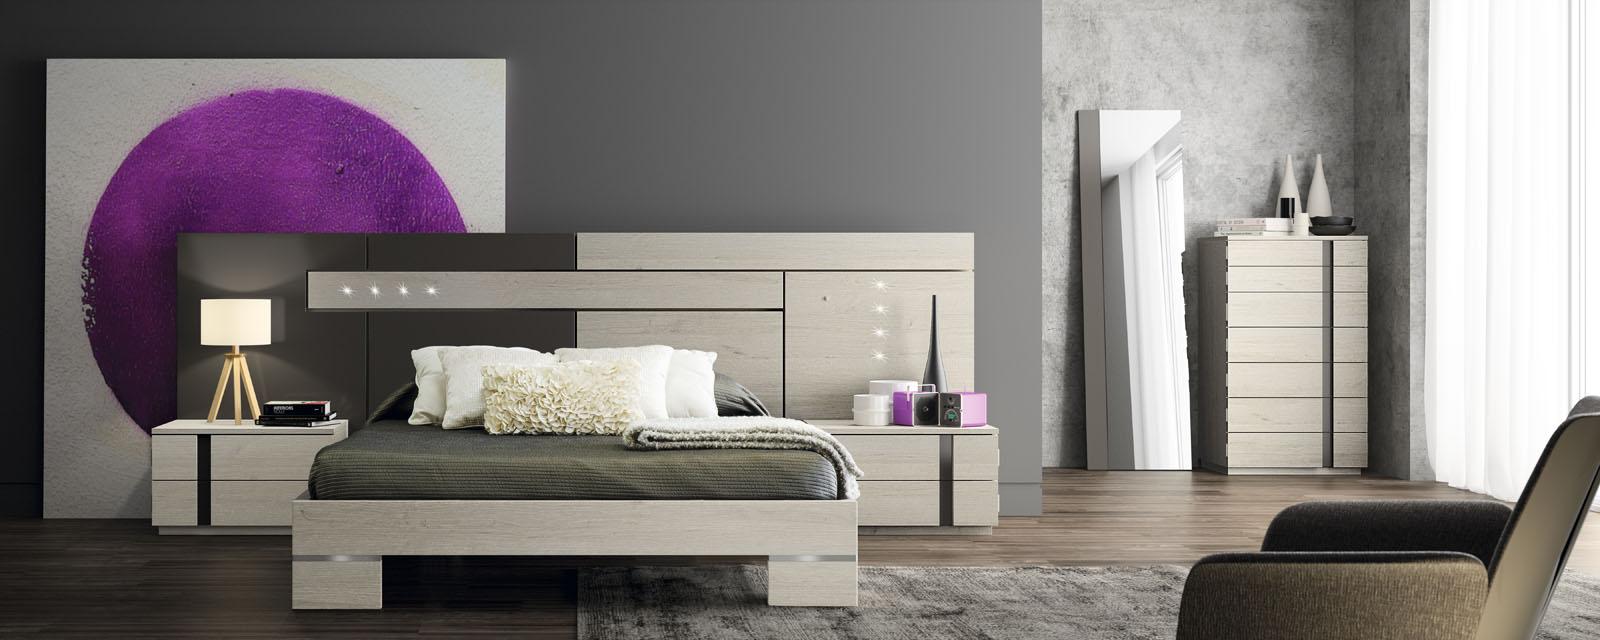 Dormitorio matrimonio con bancada y luces leds - Makro Mueble